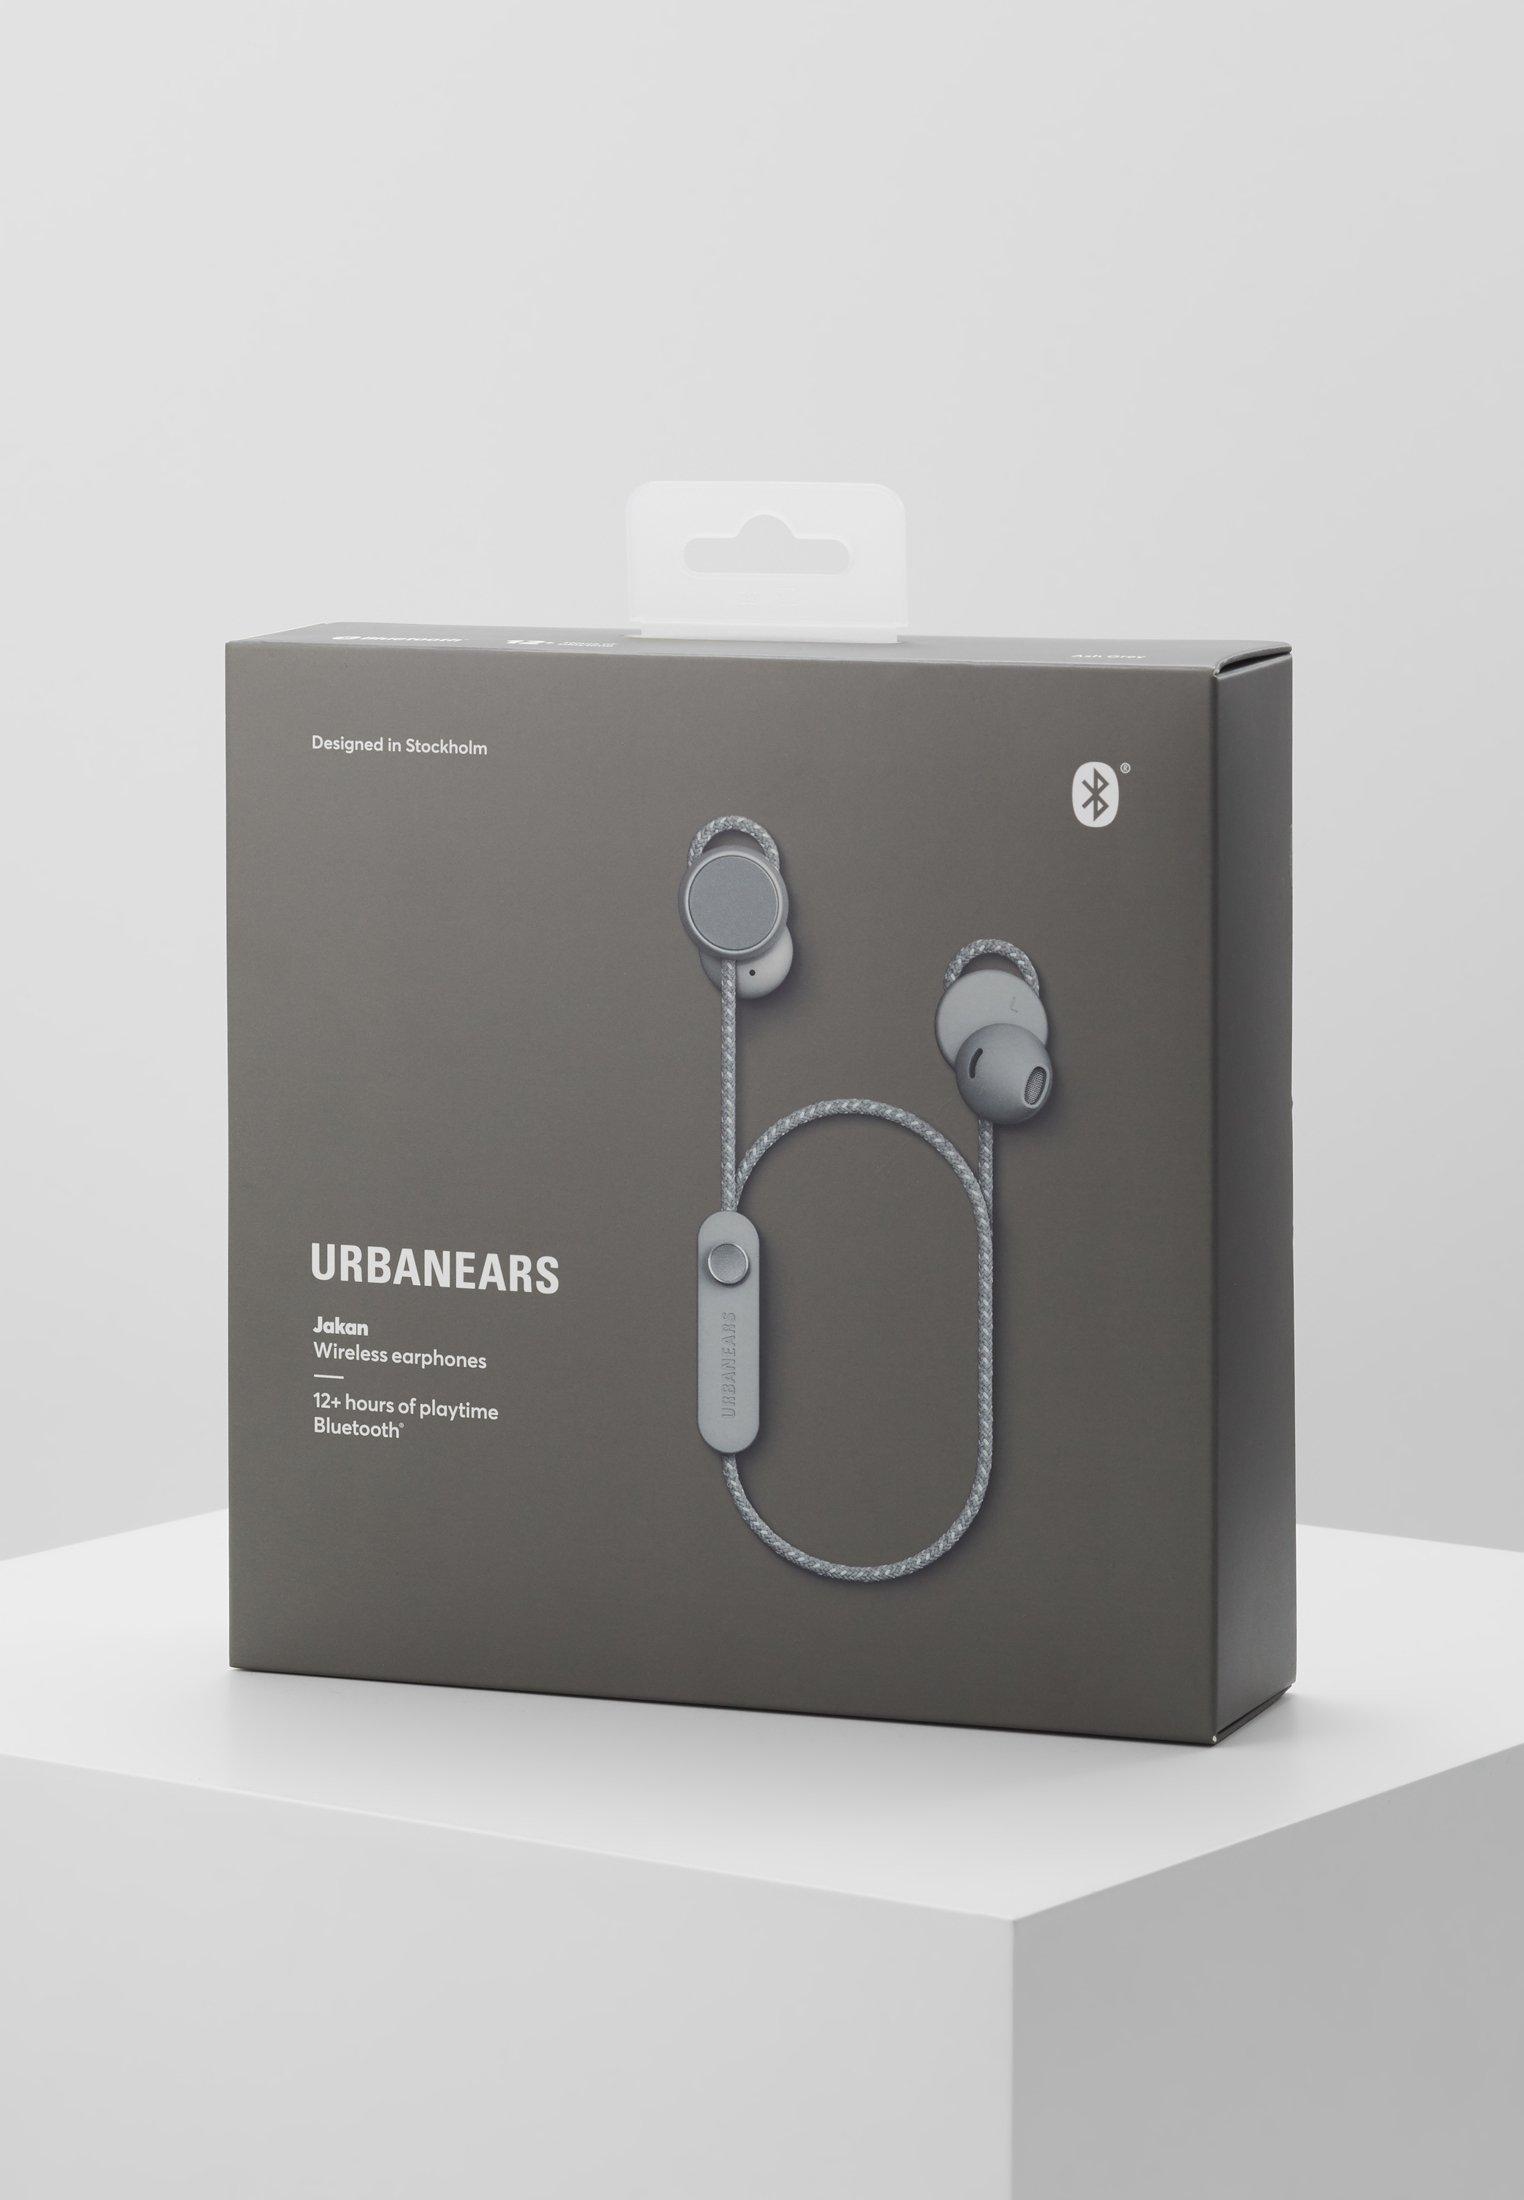 Limited Outlet Urbanears JAKAN - Headphones - ash grey | women's accessories 2020 rCvtb